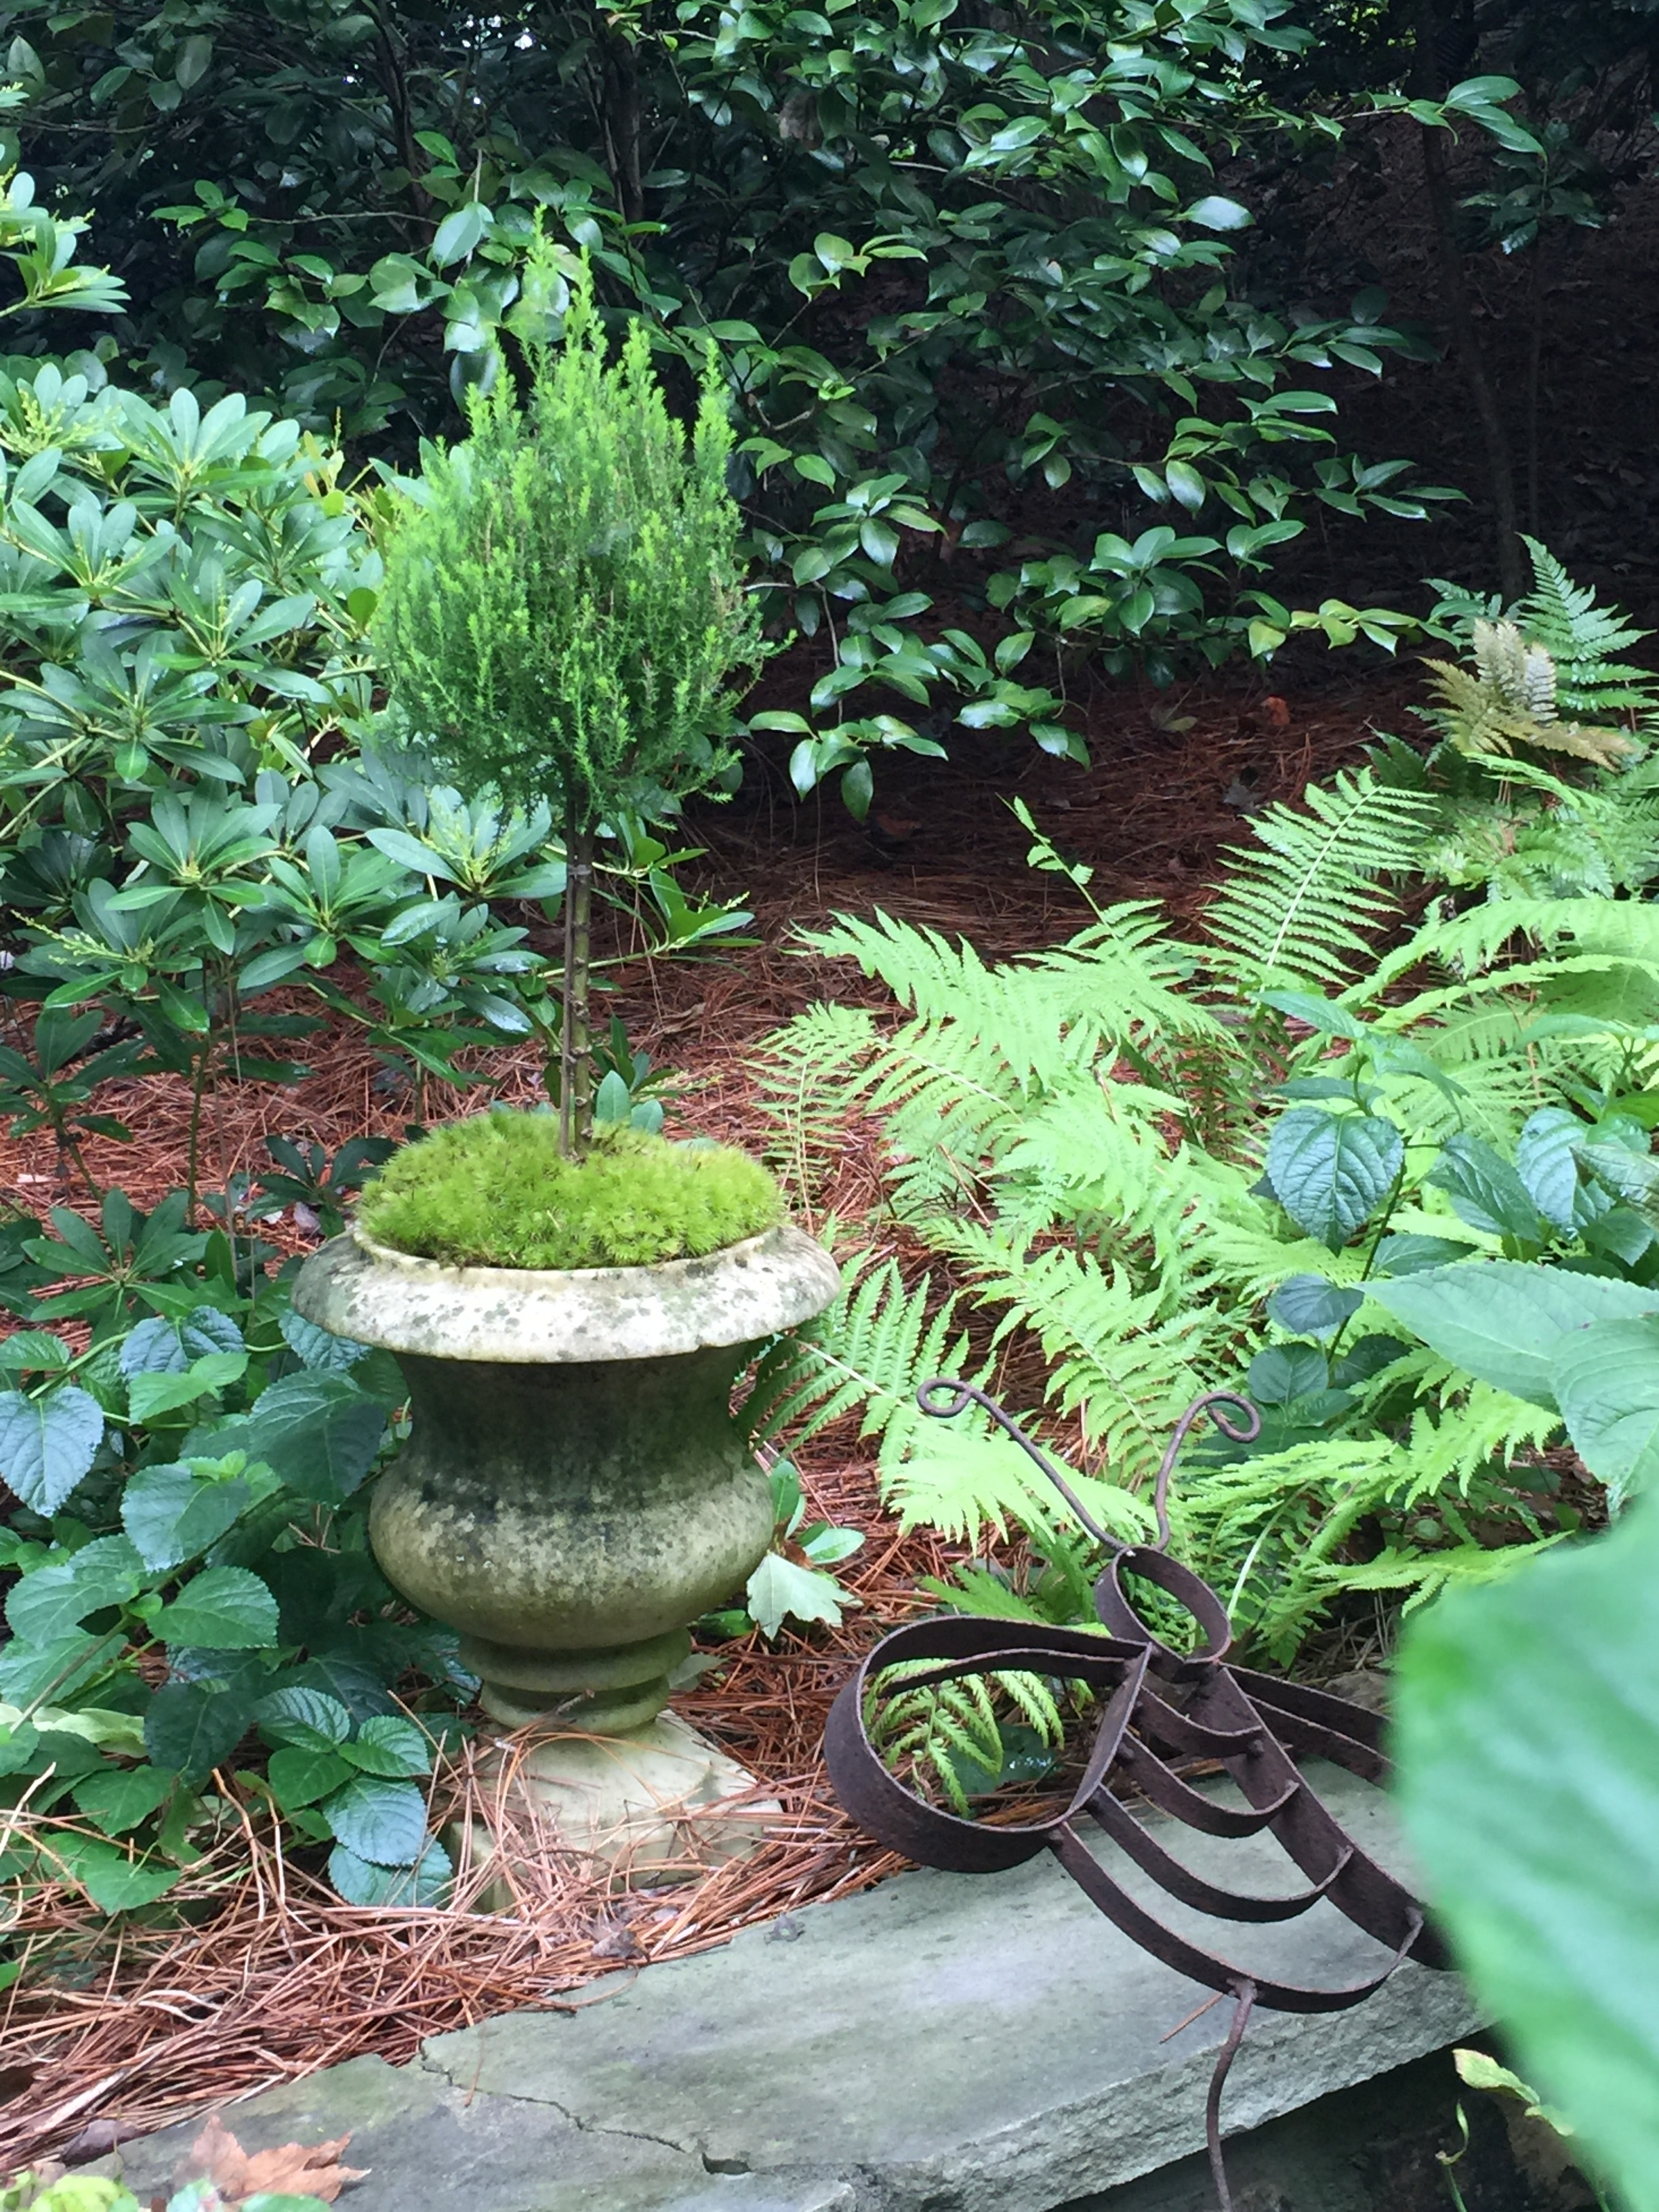 Shade gardens are very popular in hot Atlanta.